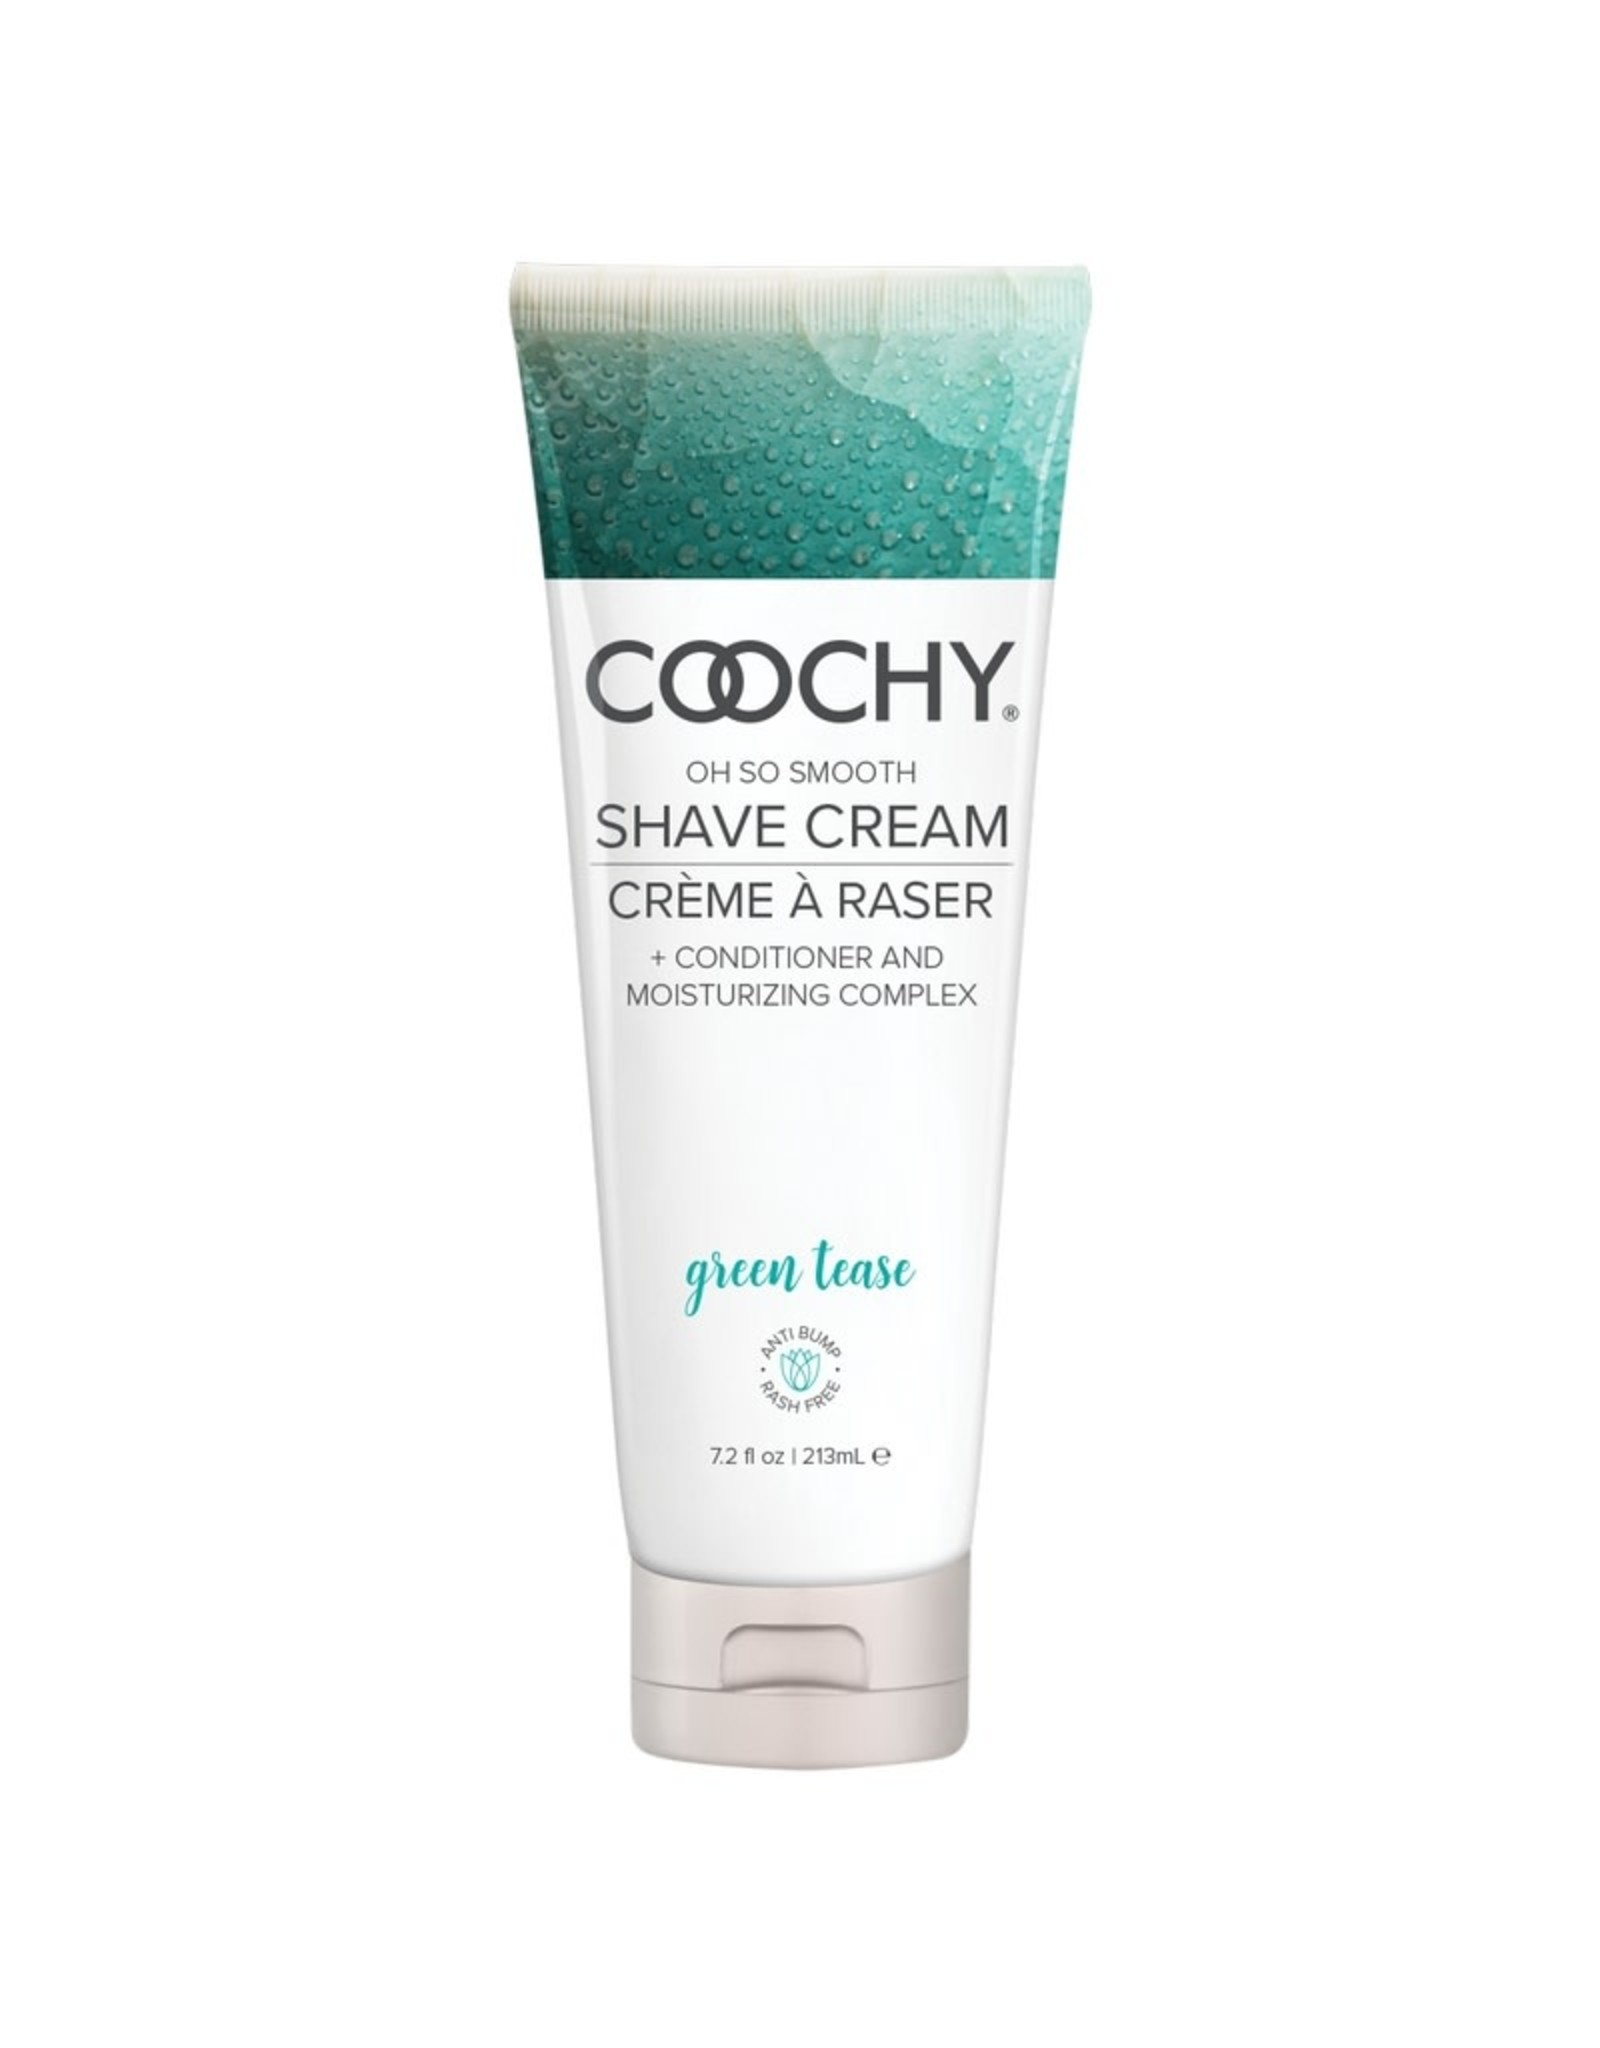 Coochy Coochy - Green Tease (7.2 oz)